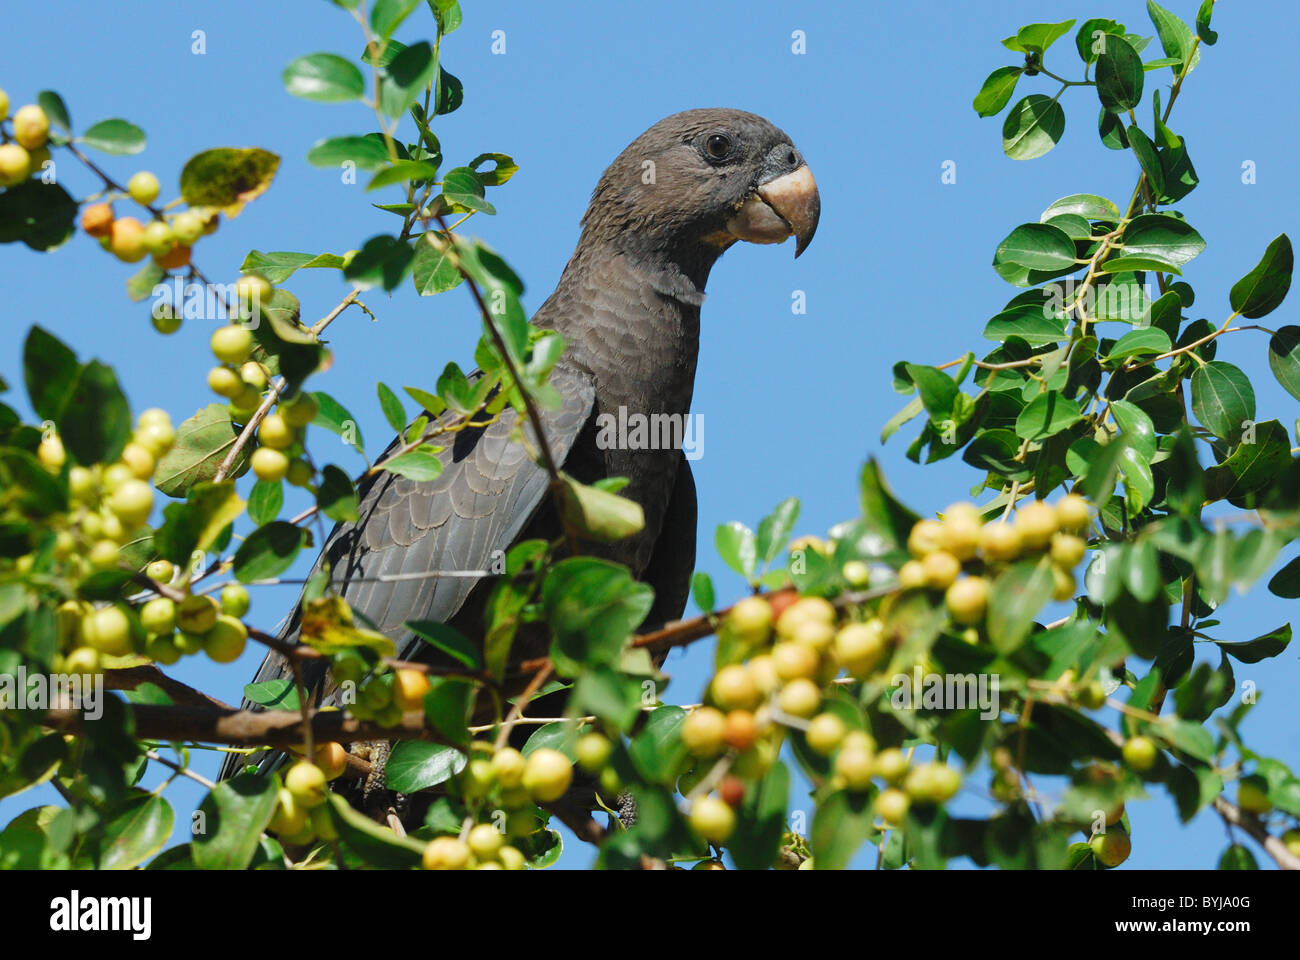 Geringerem Vasa Papagei (Coracopsis Nigra) ernähren sich von Beeren Stockbild